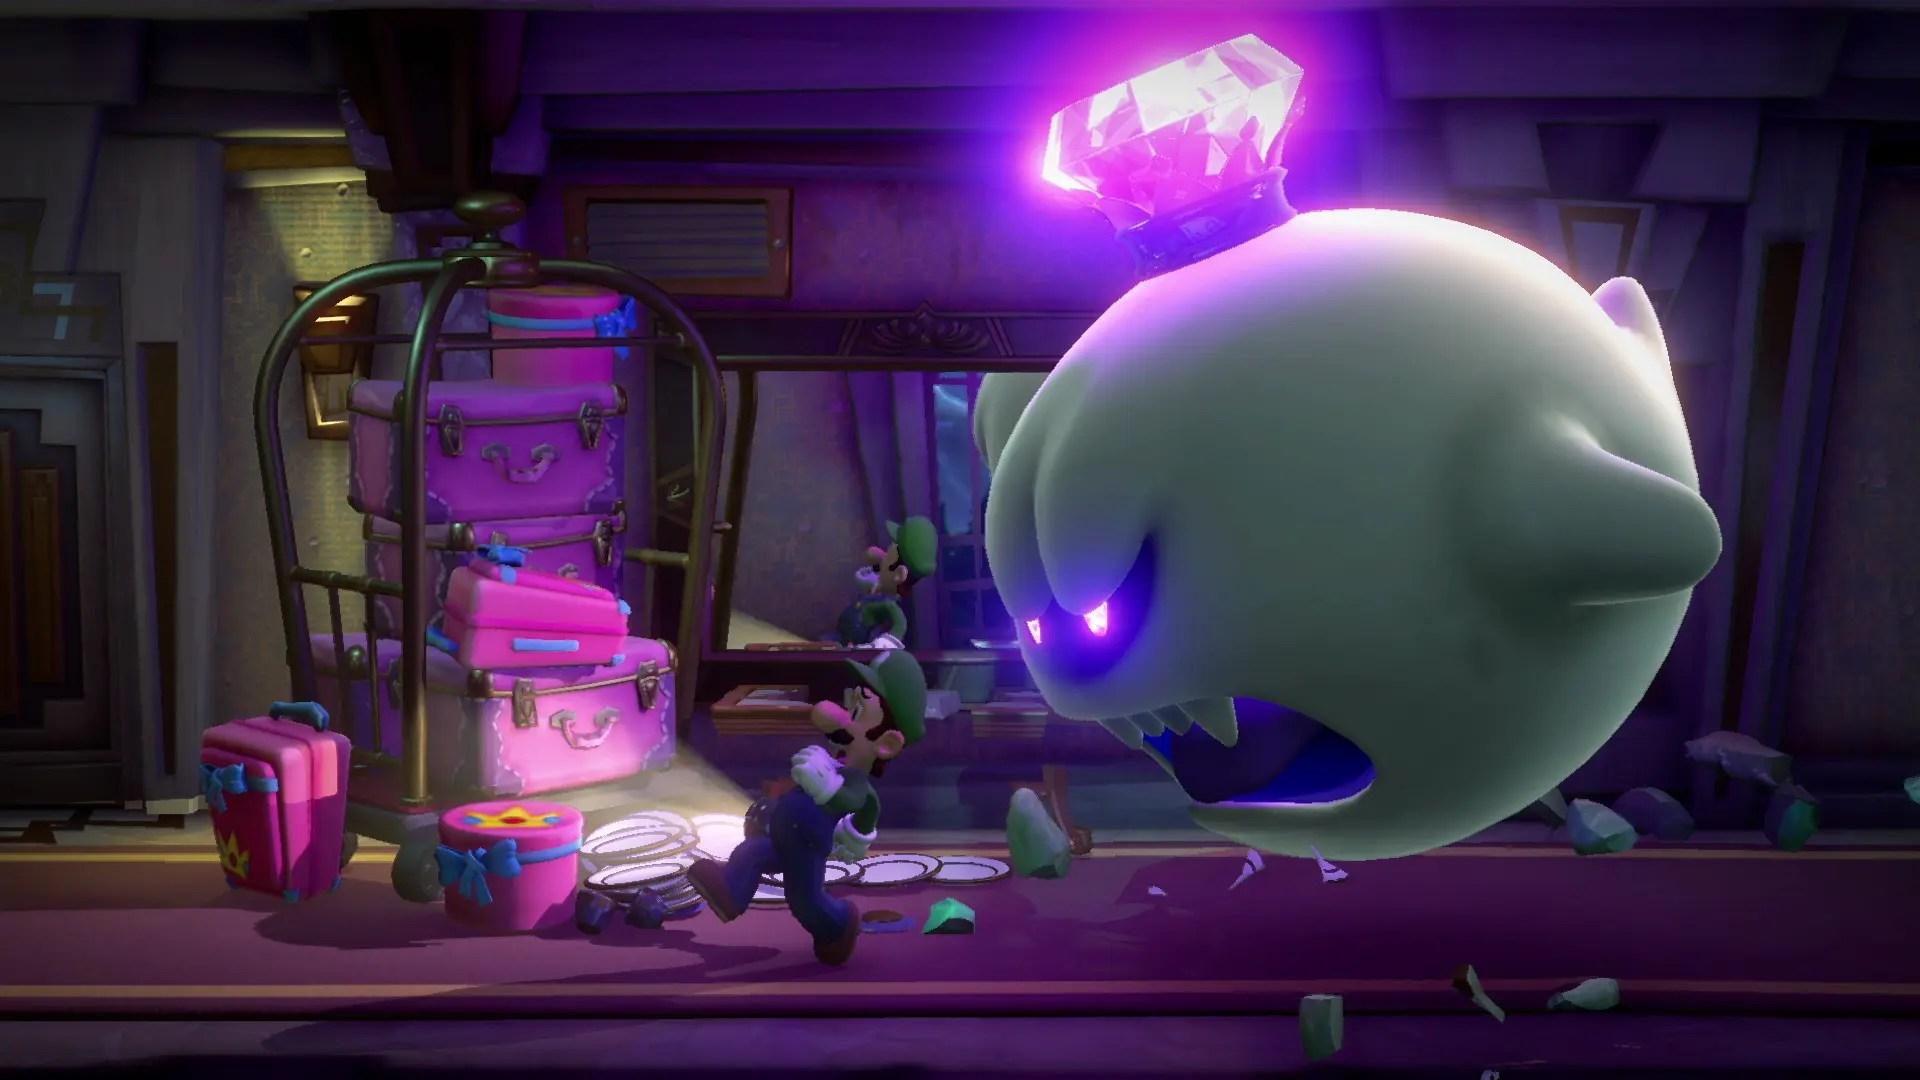 Luigi's Mansion 3 E3 2019 Screenshot 4